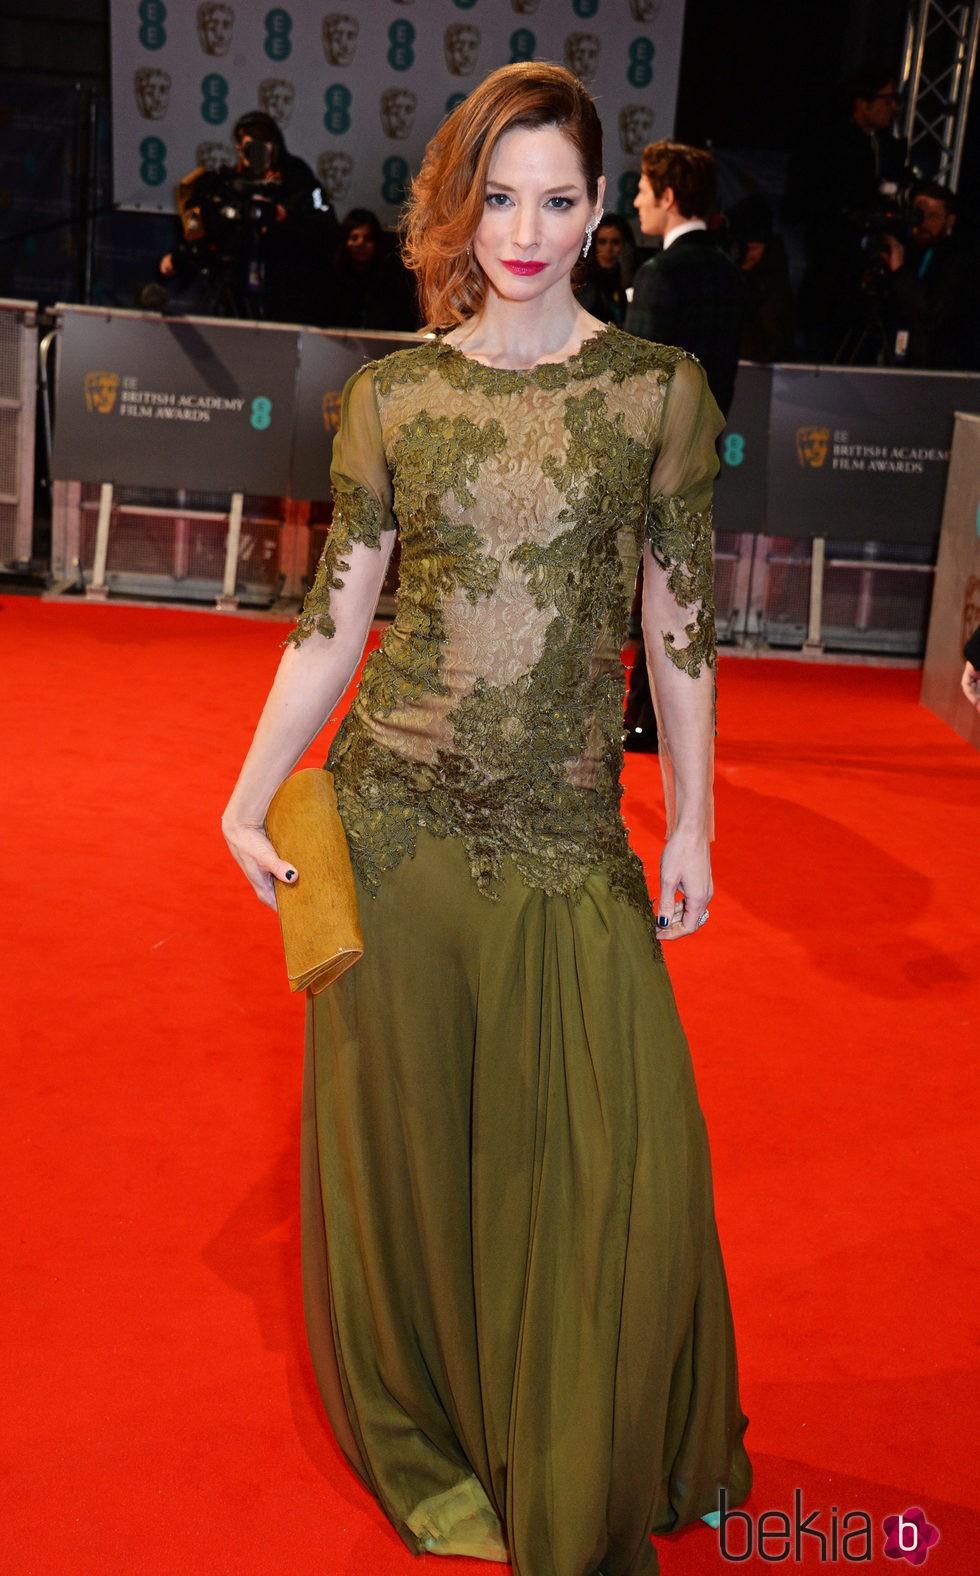 Sienna Guillory en los BAFTA 2015